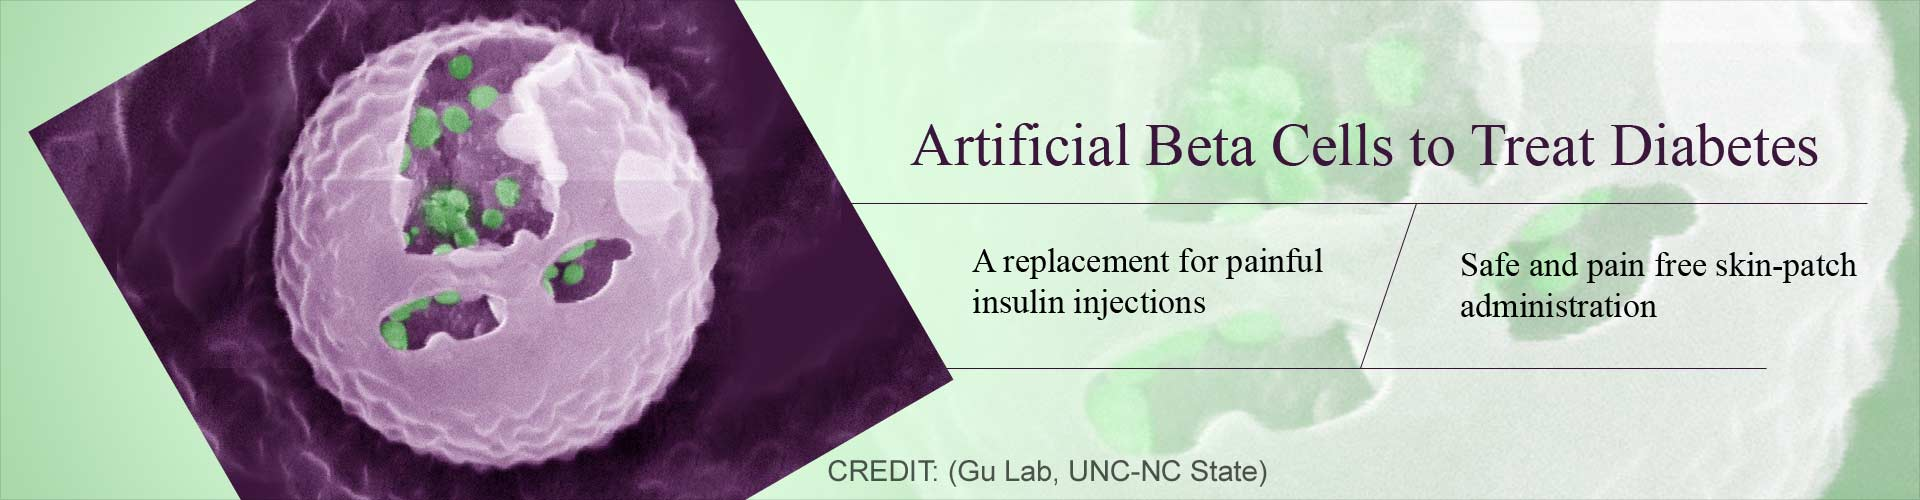 Artificial Beta Cells - the Way Forward for Diabetes Treatment